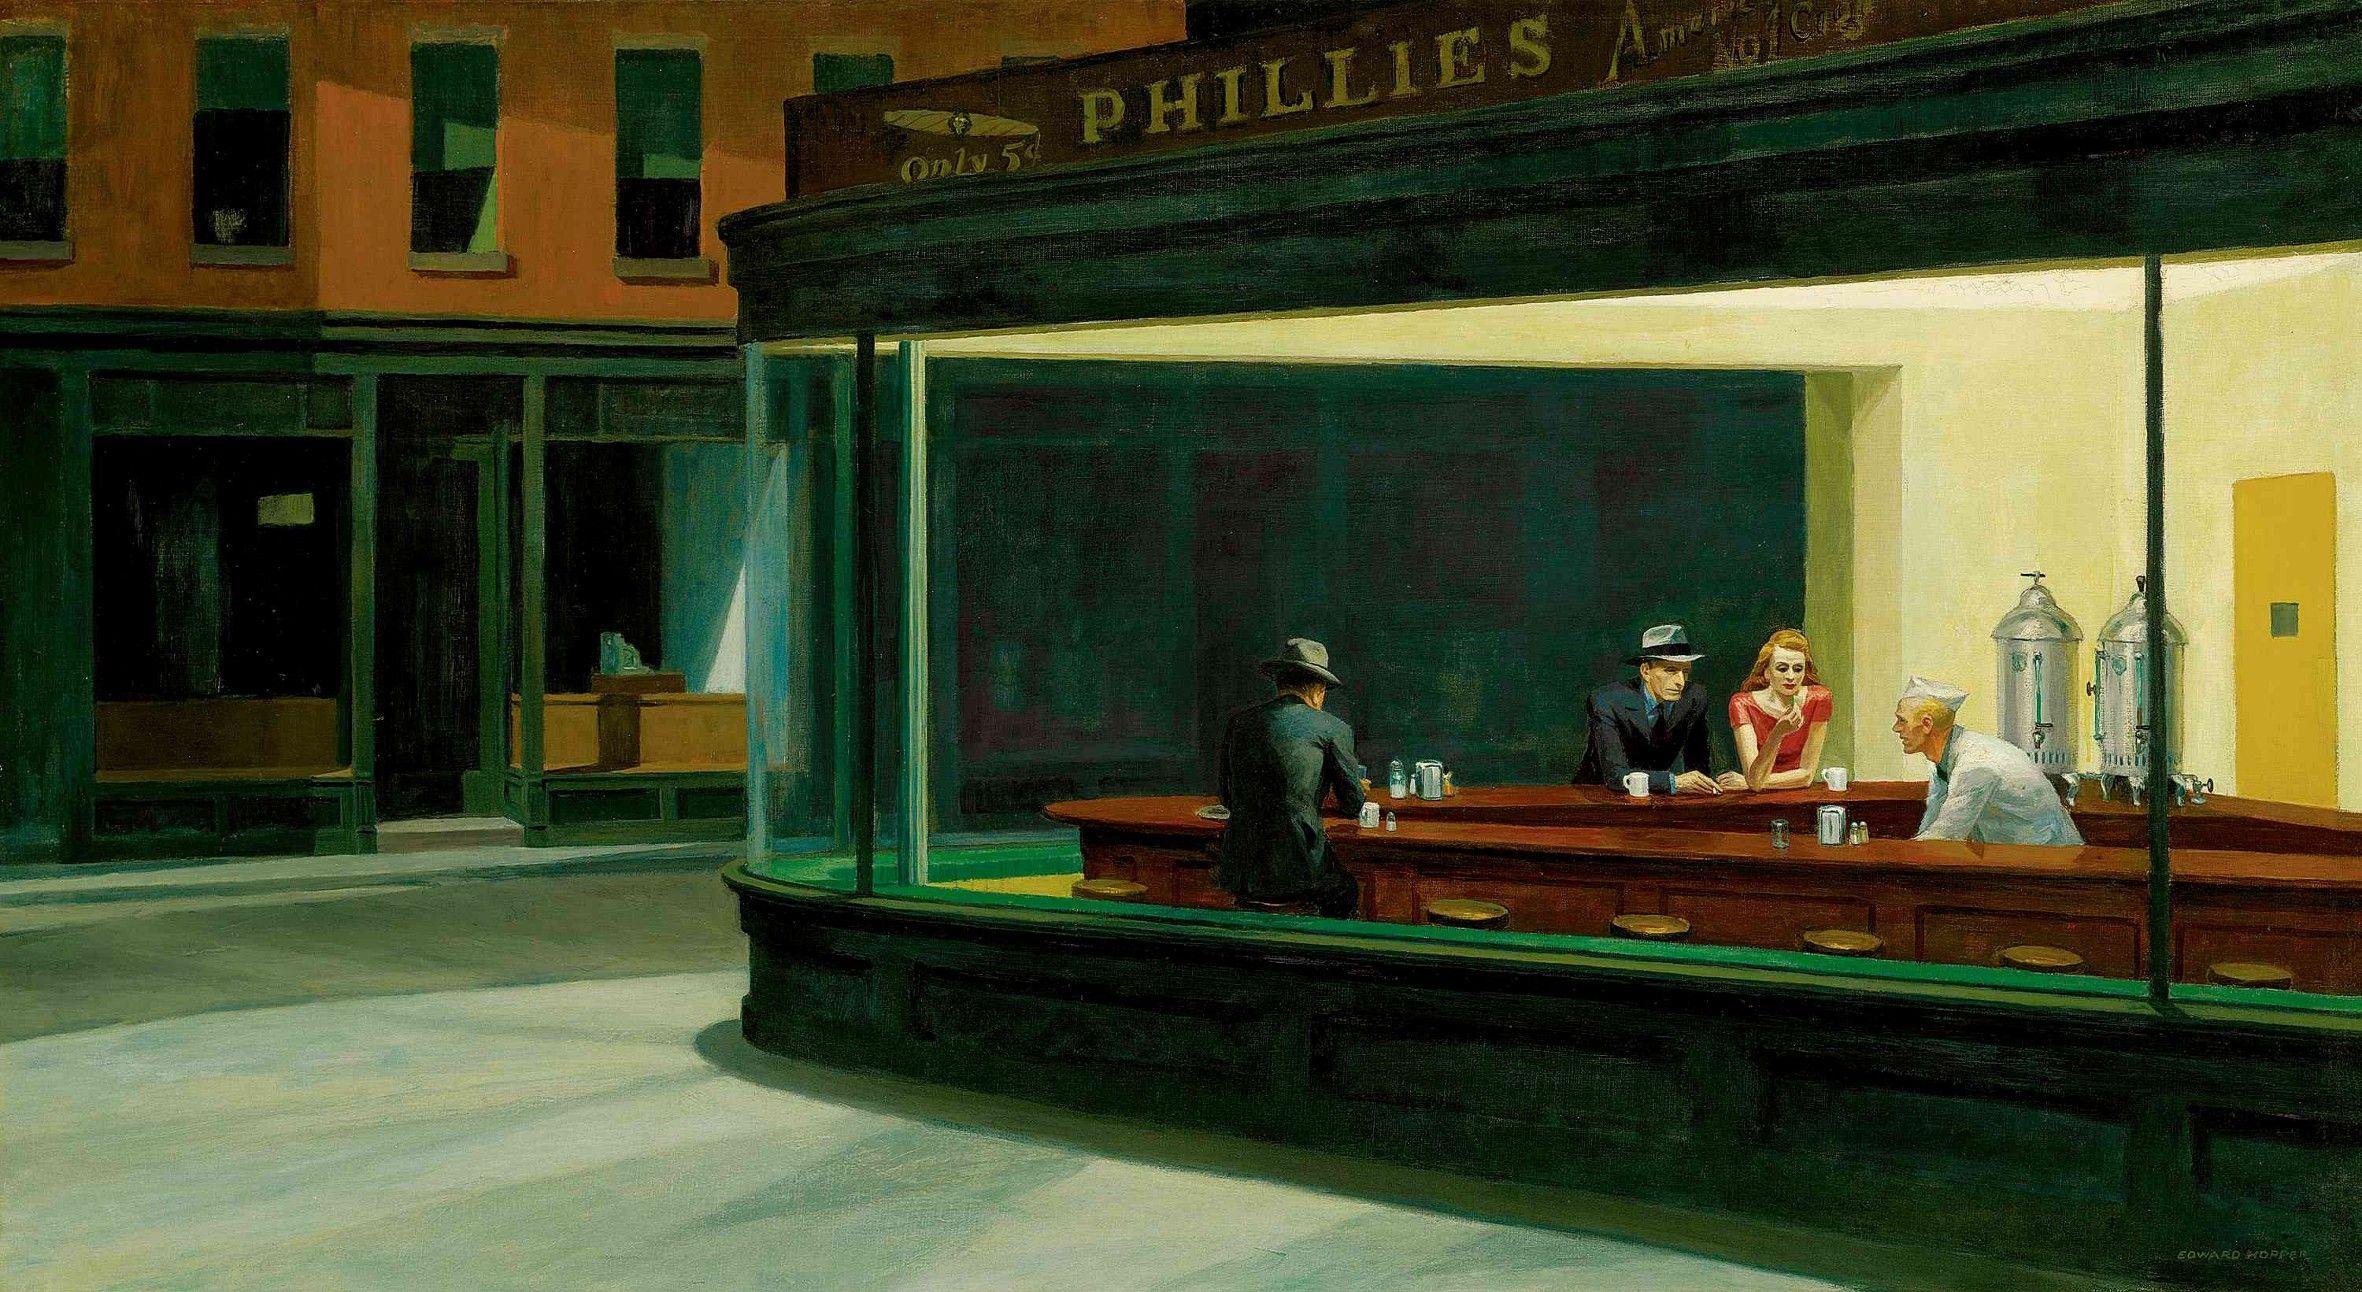 Variaciones Edward Hopper | Pinturas, Arte y Edward hopper